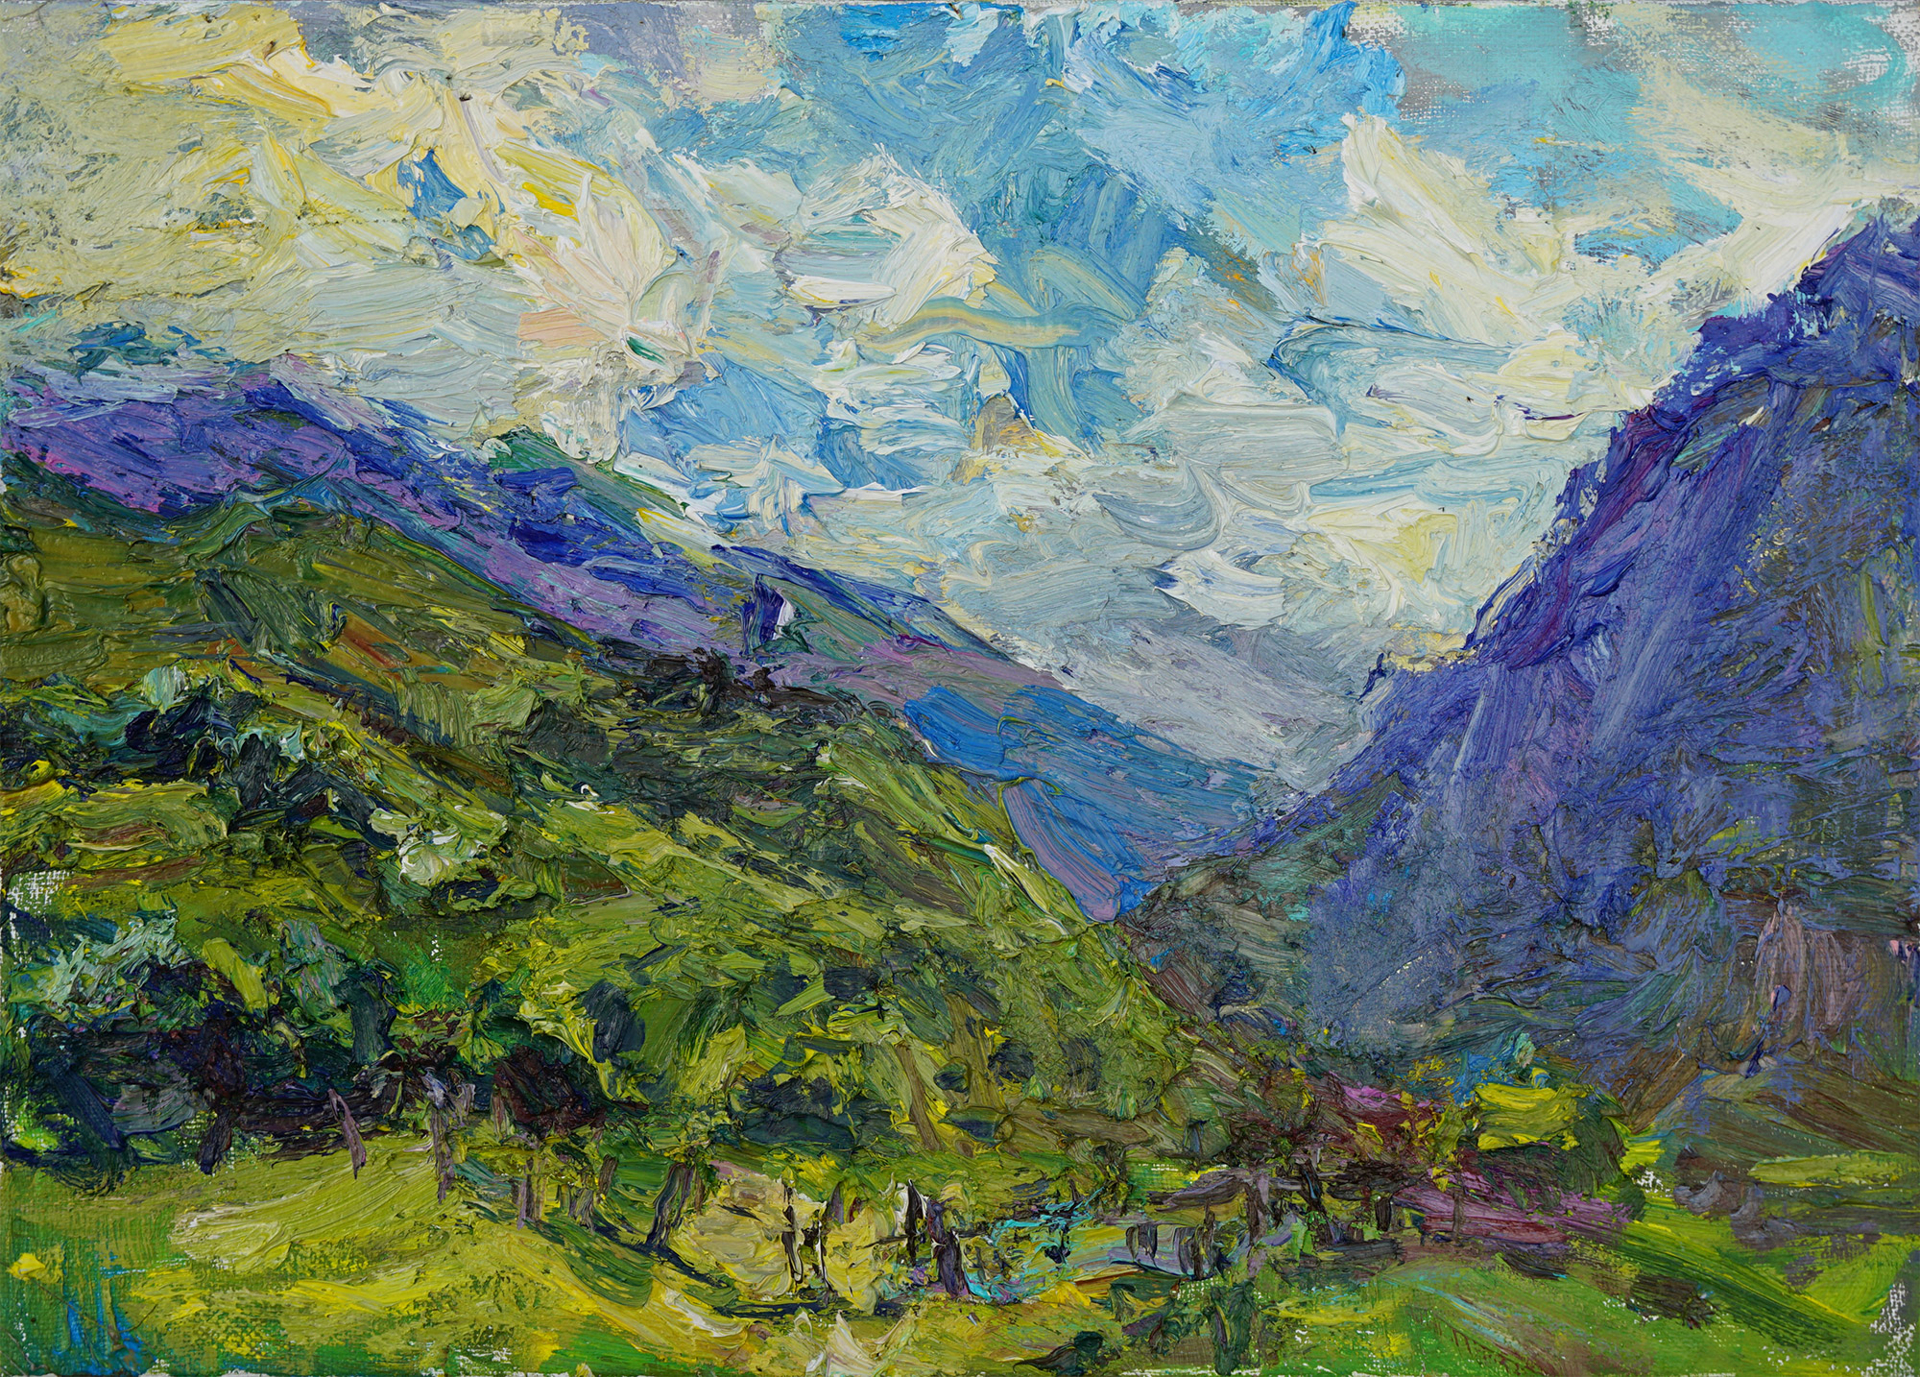 Mountain Evening by Ulrich Gleiter